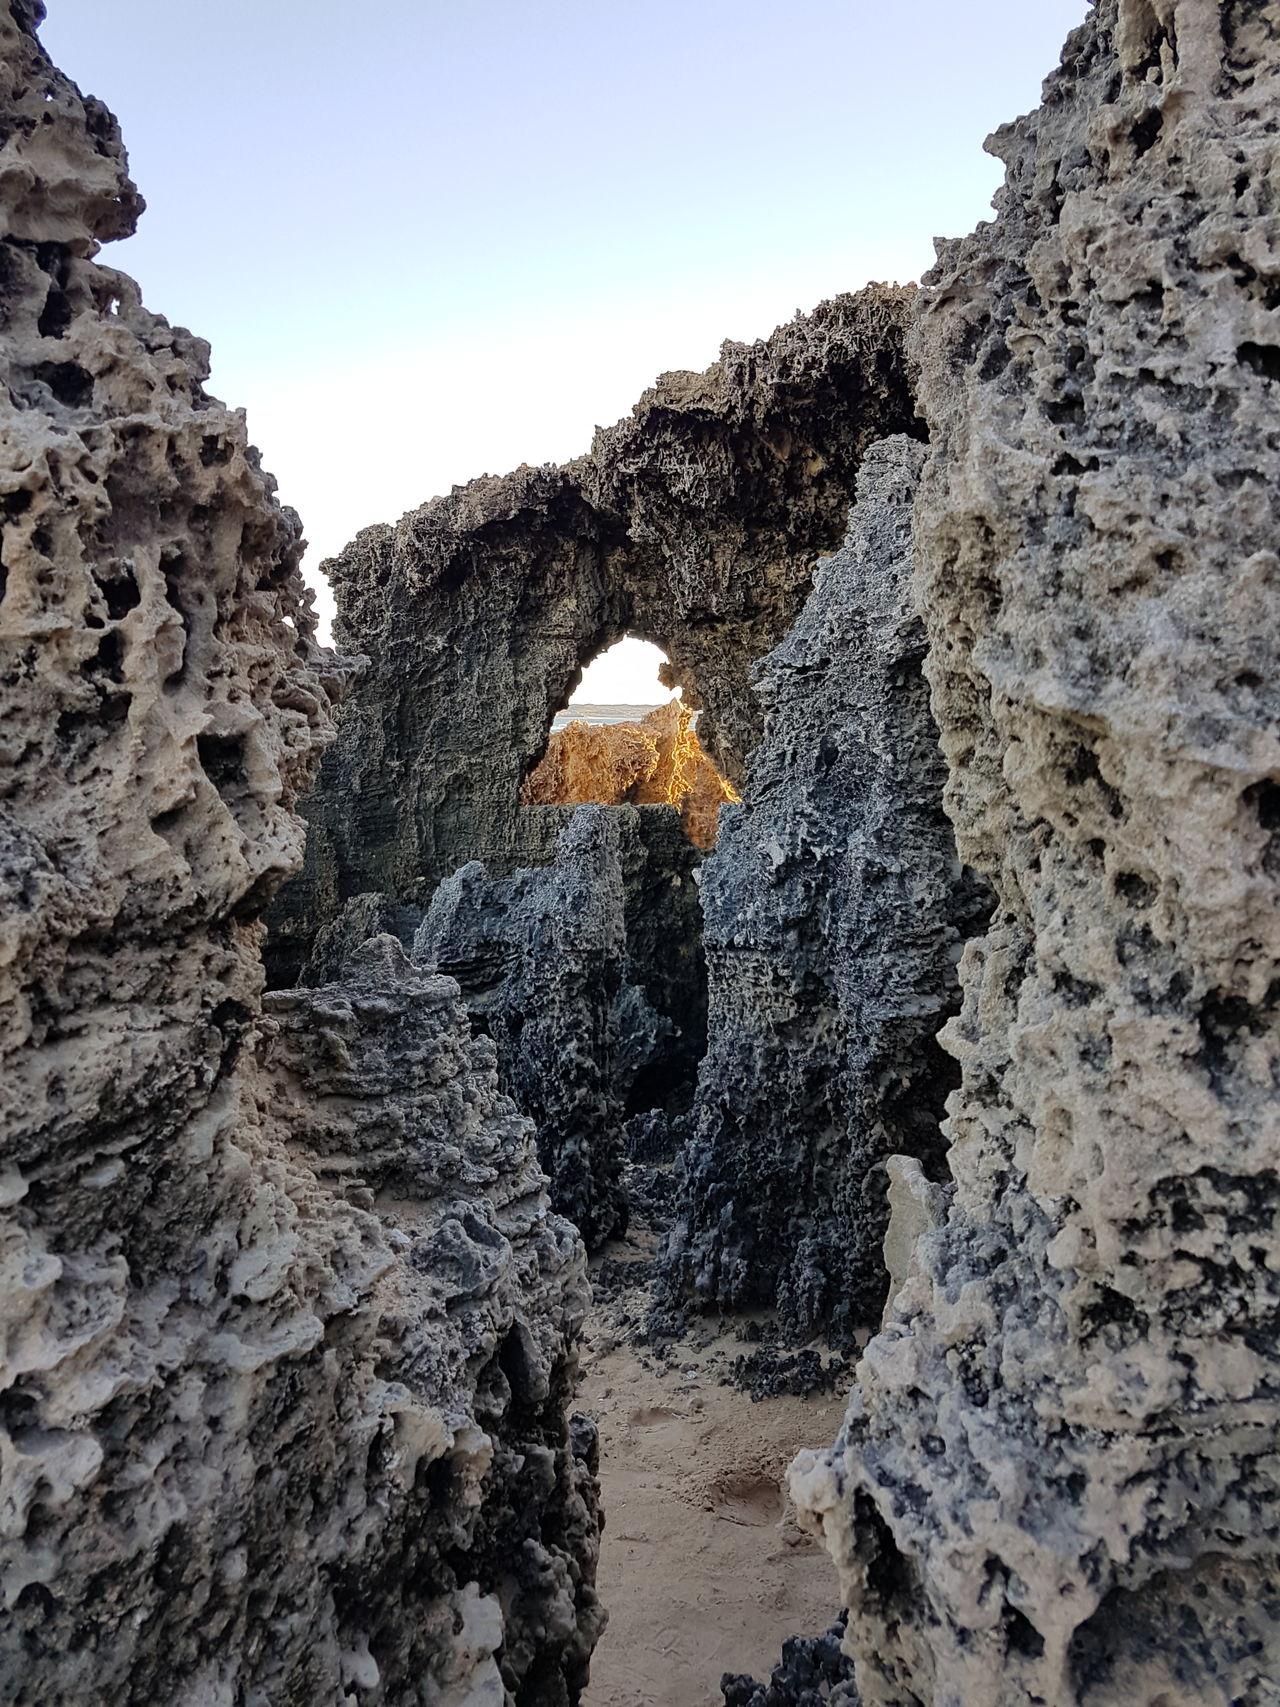 Nature rocks